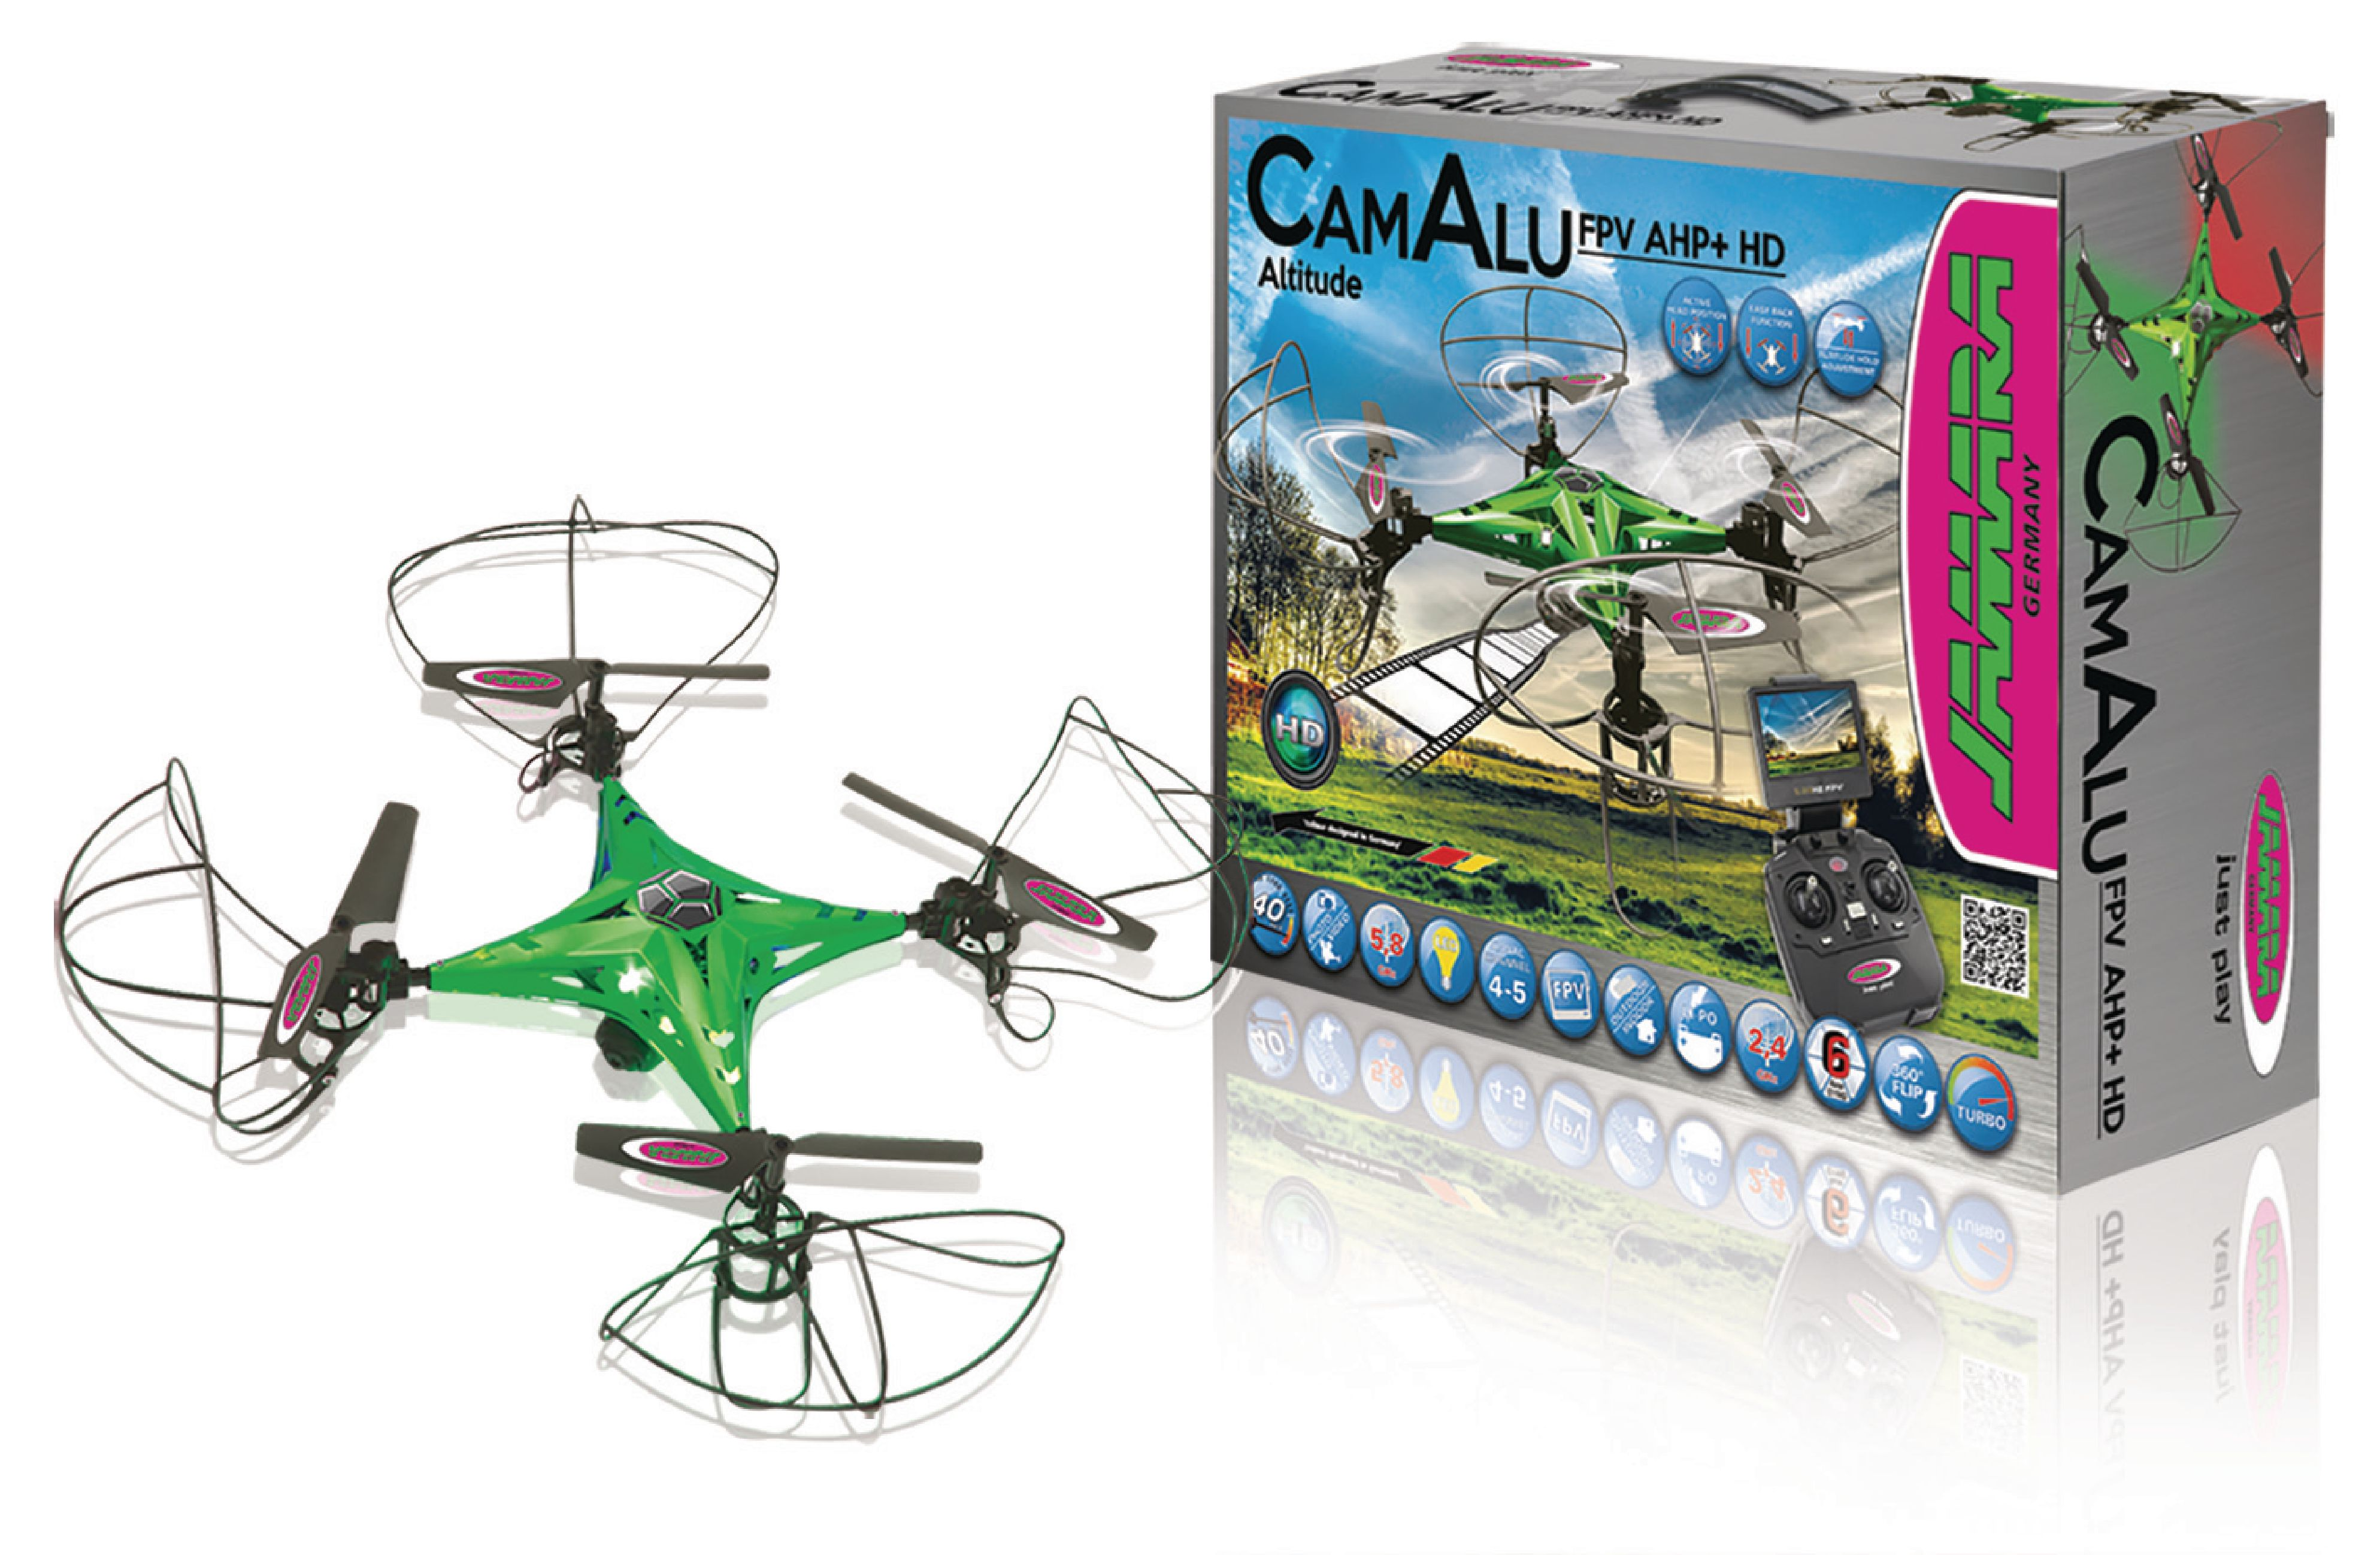 R/C Drone CamAlu 4+5 Channel RTF / Foto / Video / Gyro Indeni / Med Belysning / 360 Flip / FPV 2,4 GHz Styring Grøn